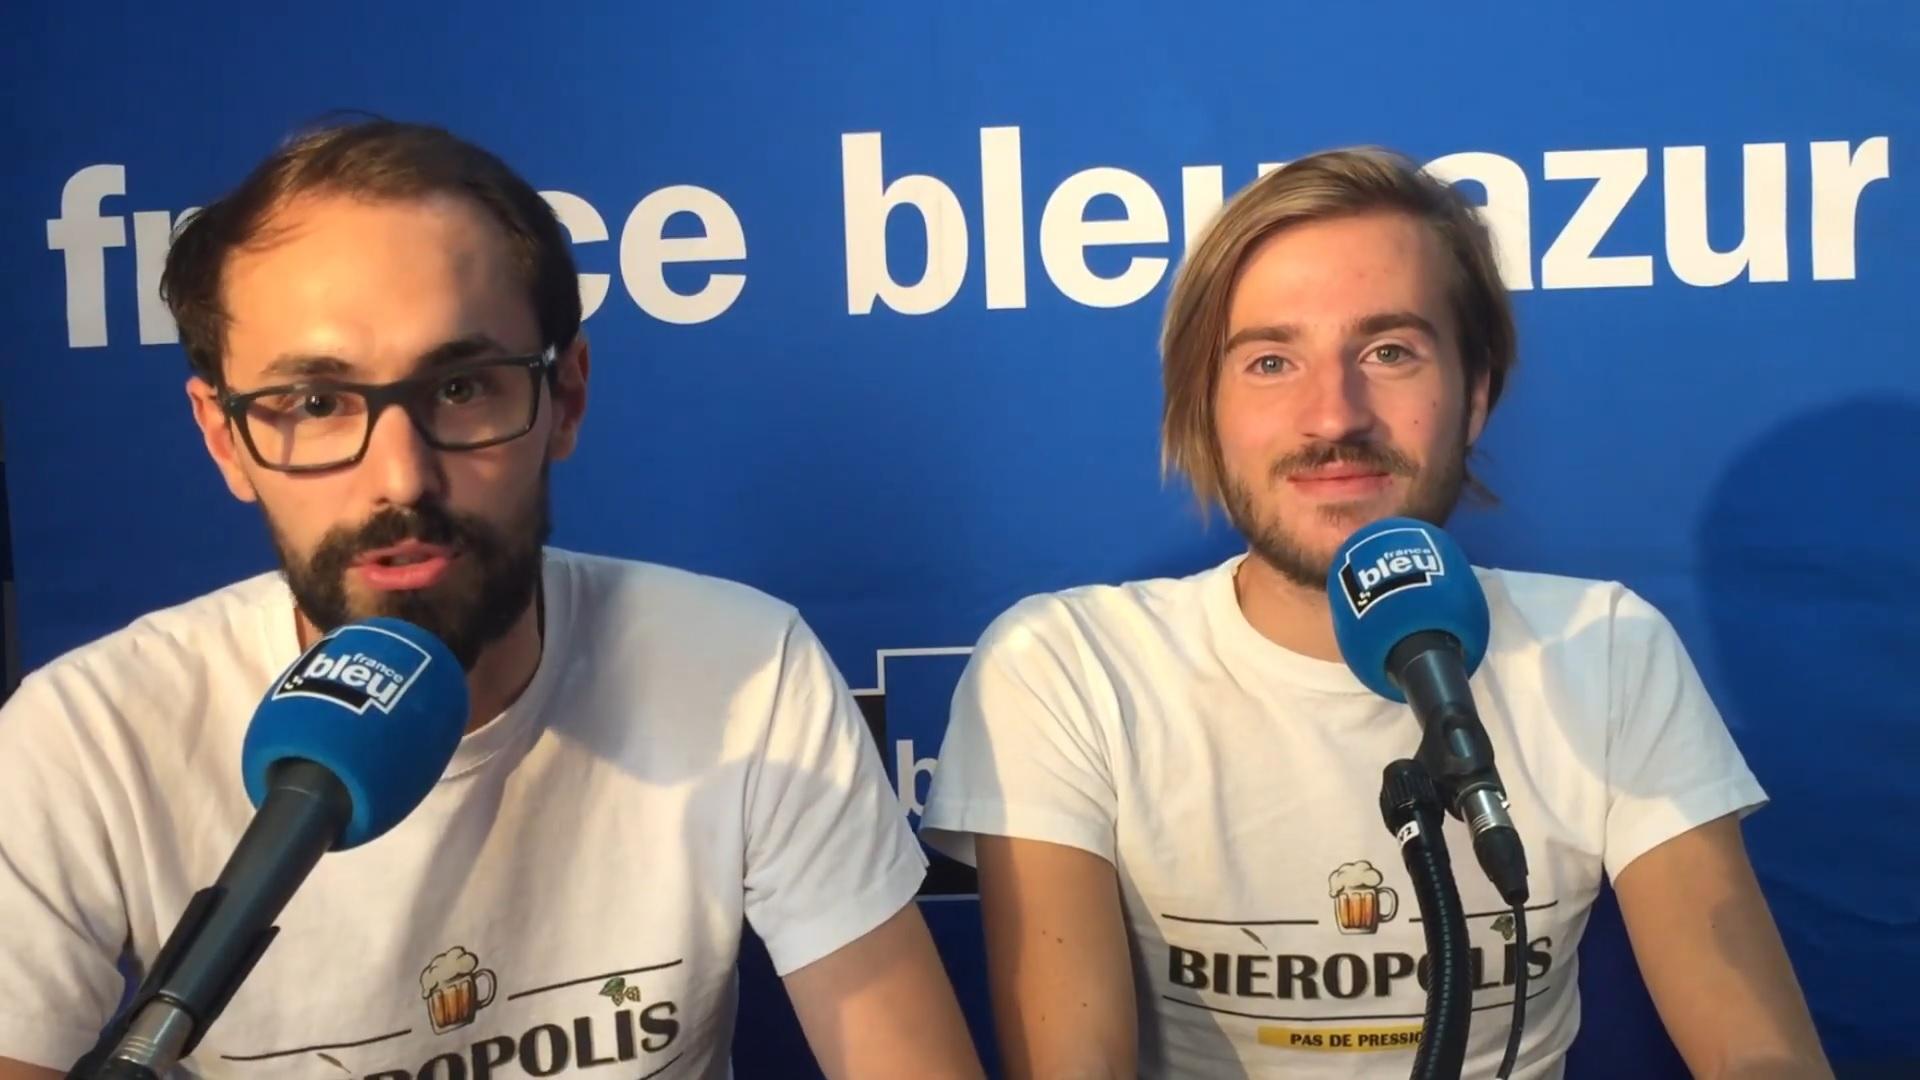 Bieropolis interview